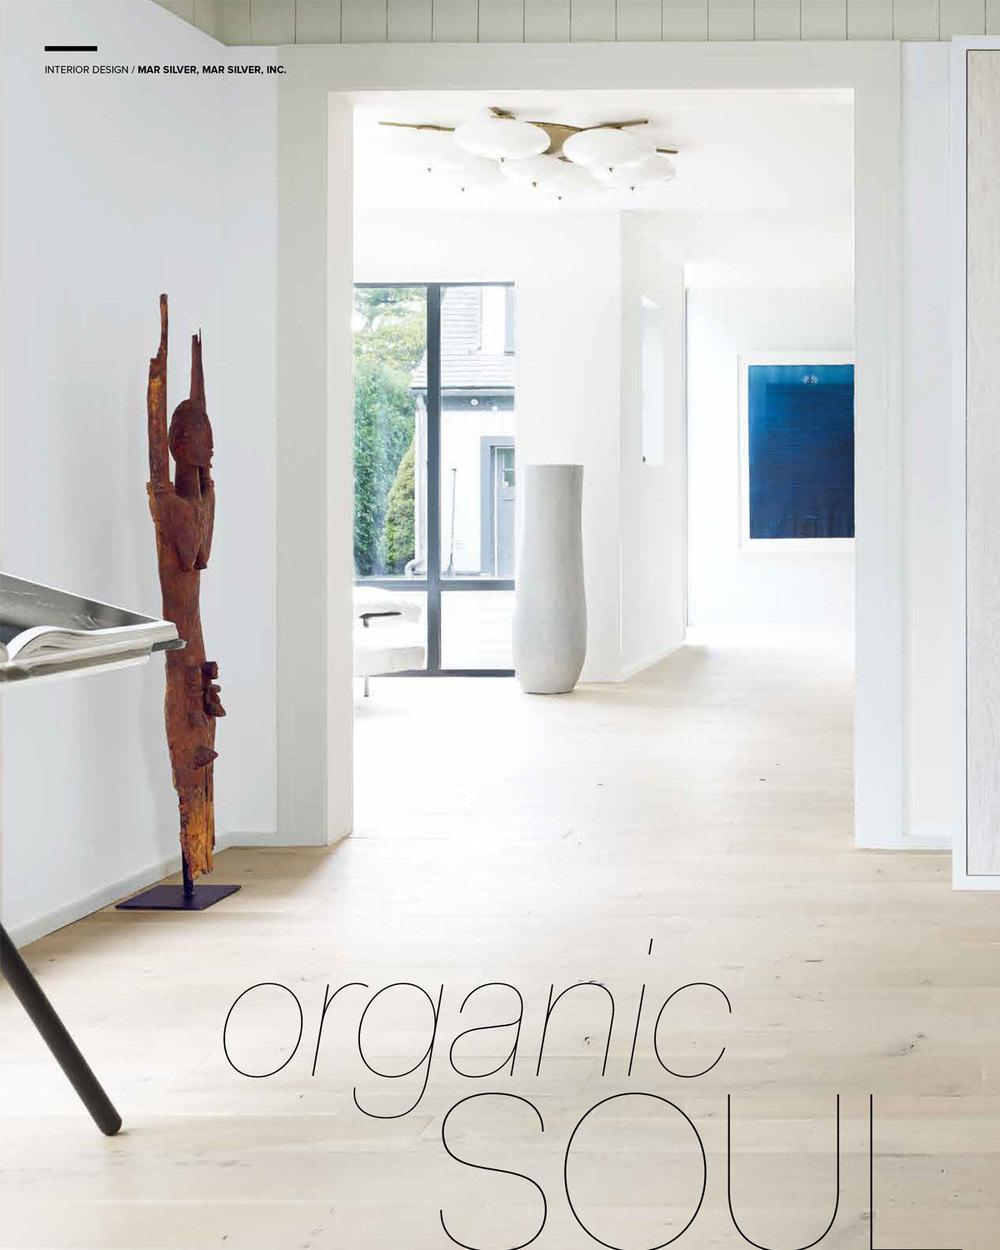 Luxe Organic Soul